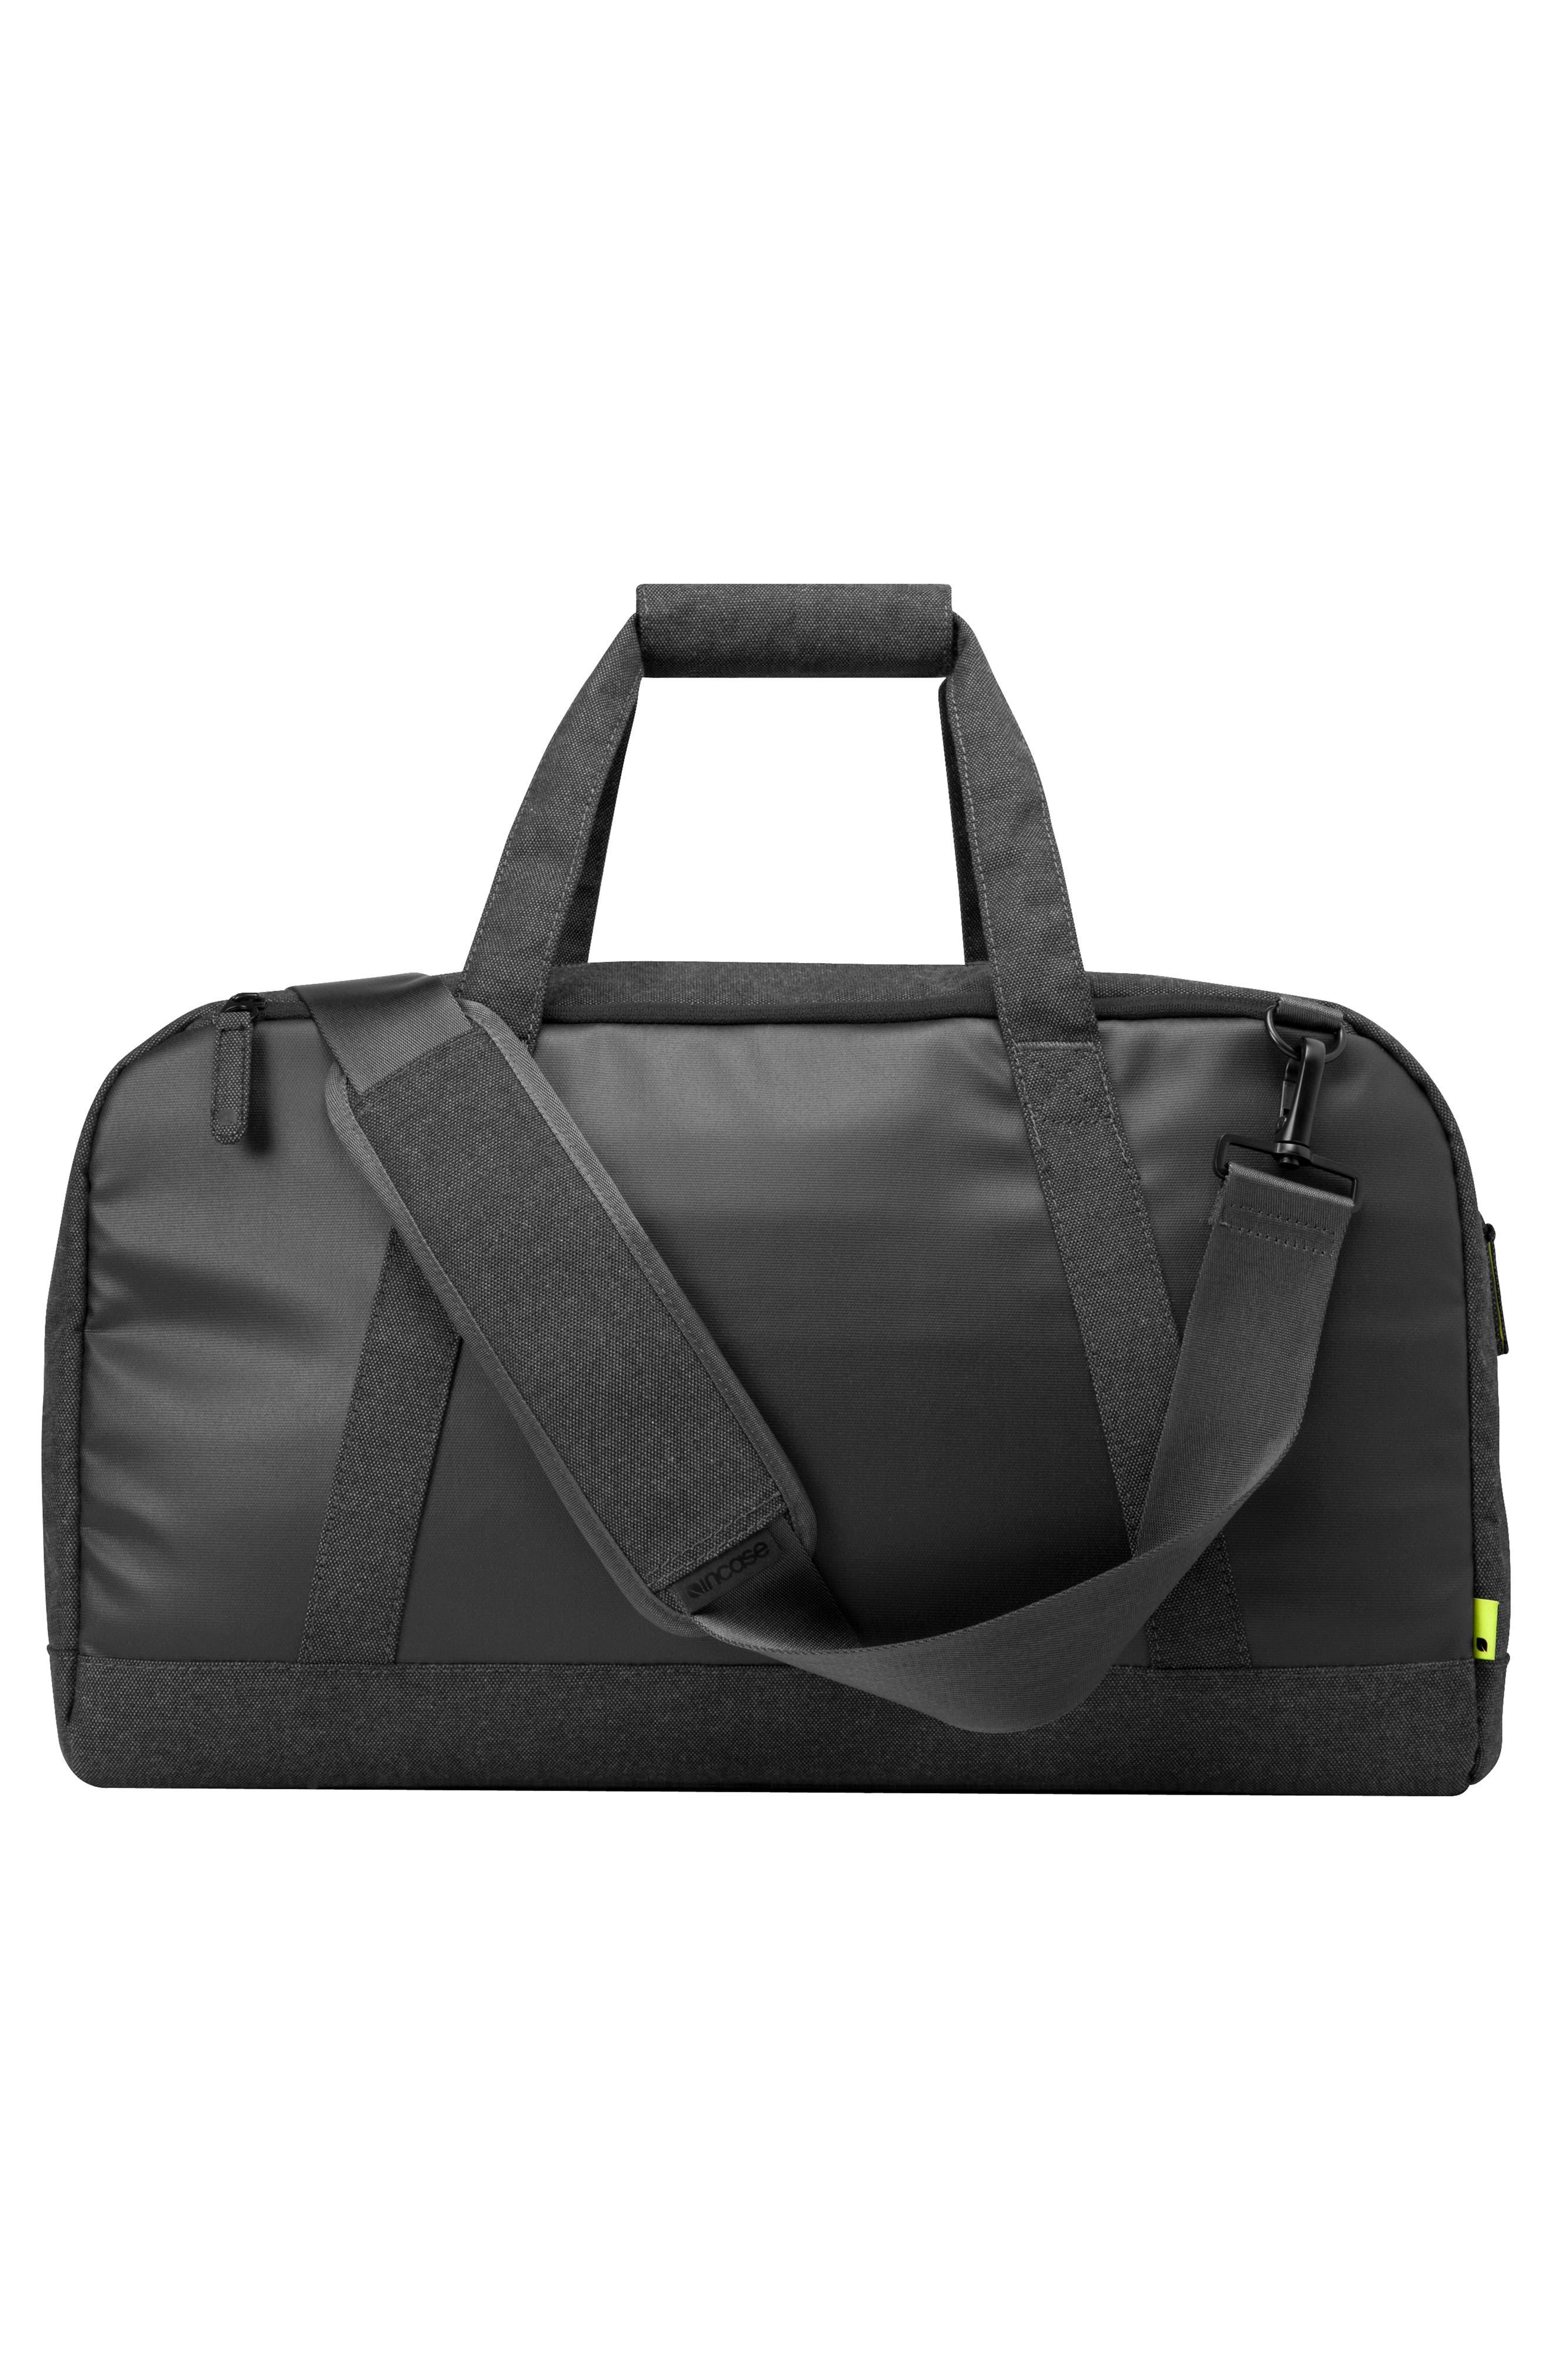 INCASE DESIGNS,                             EO Duffel Bag,                             Alternate thumbnail 3, color,                             BLACK